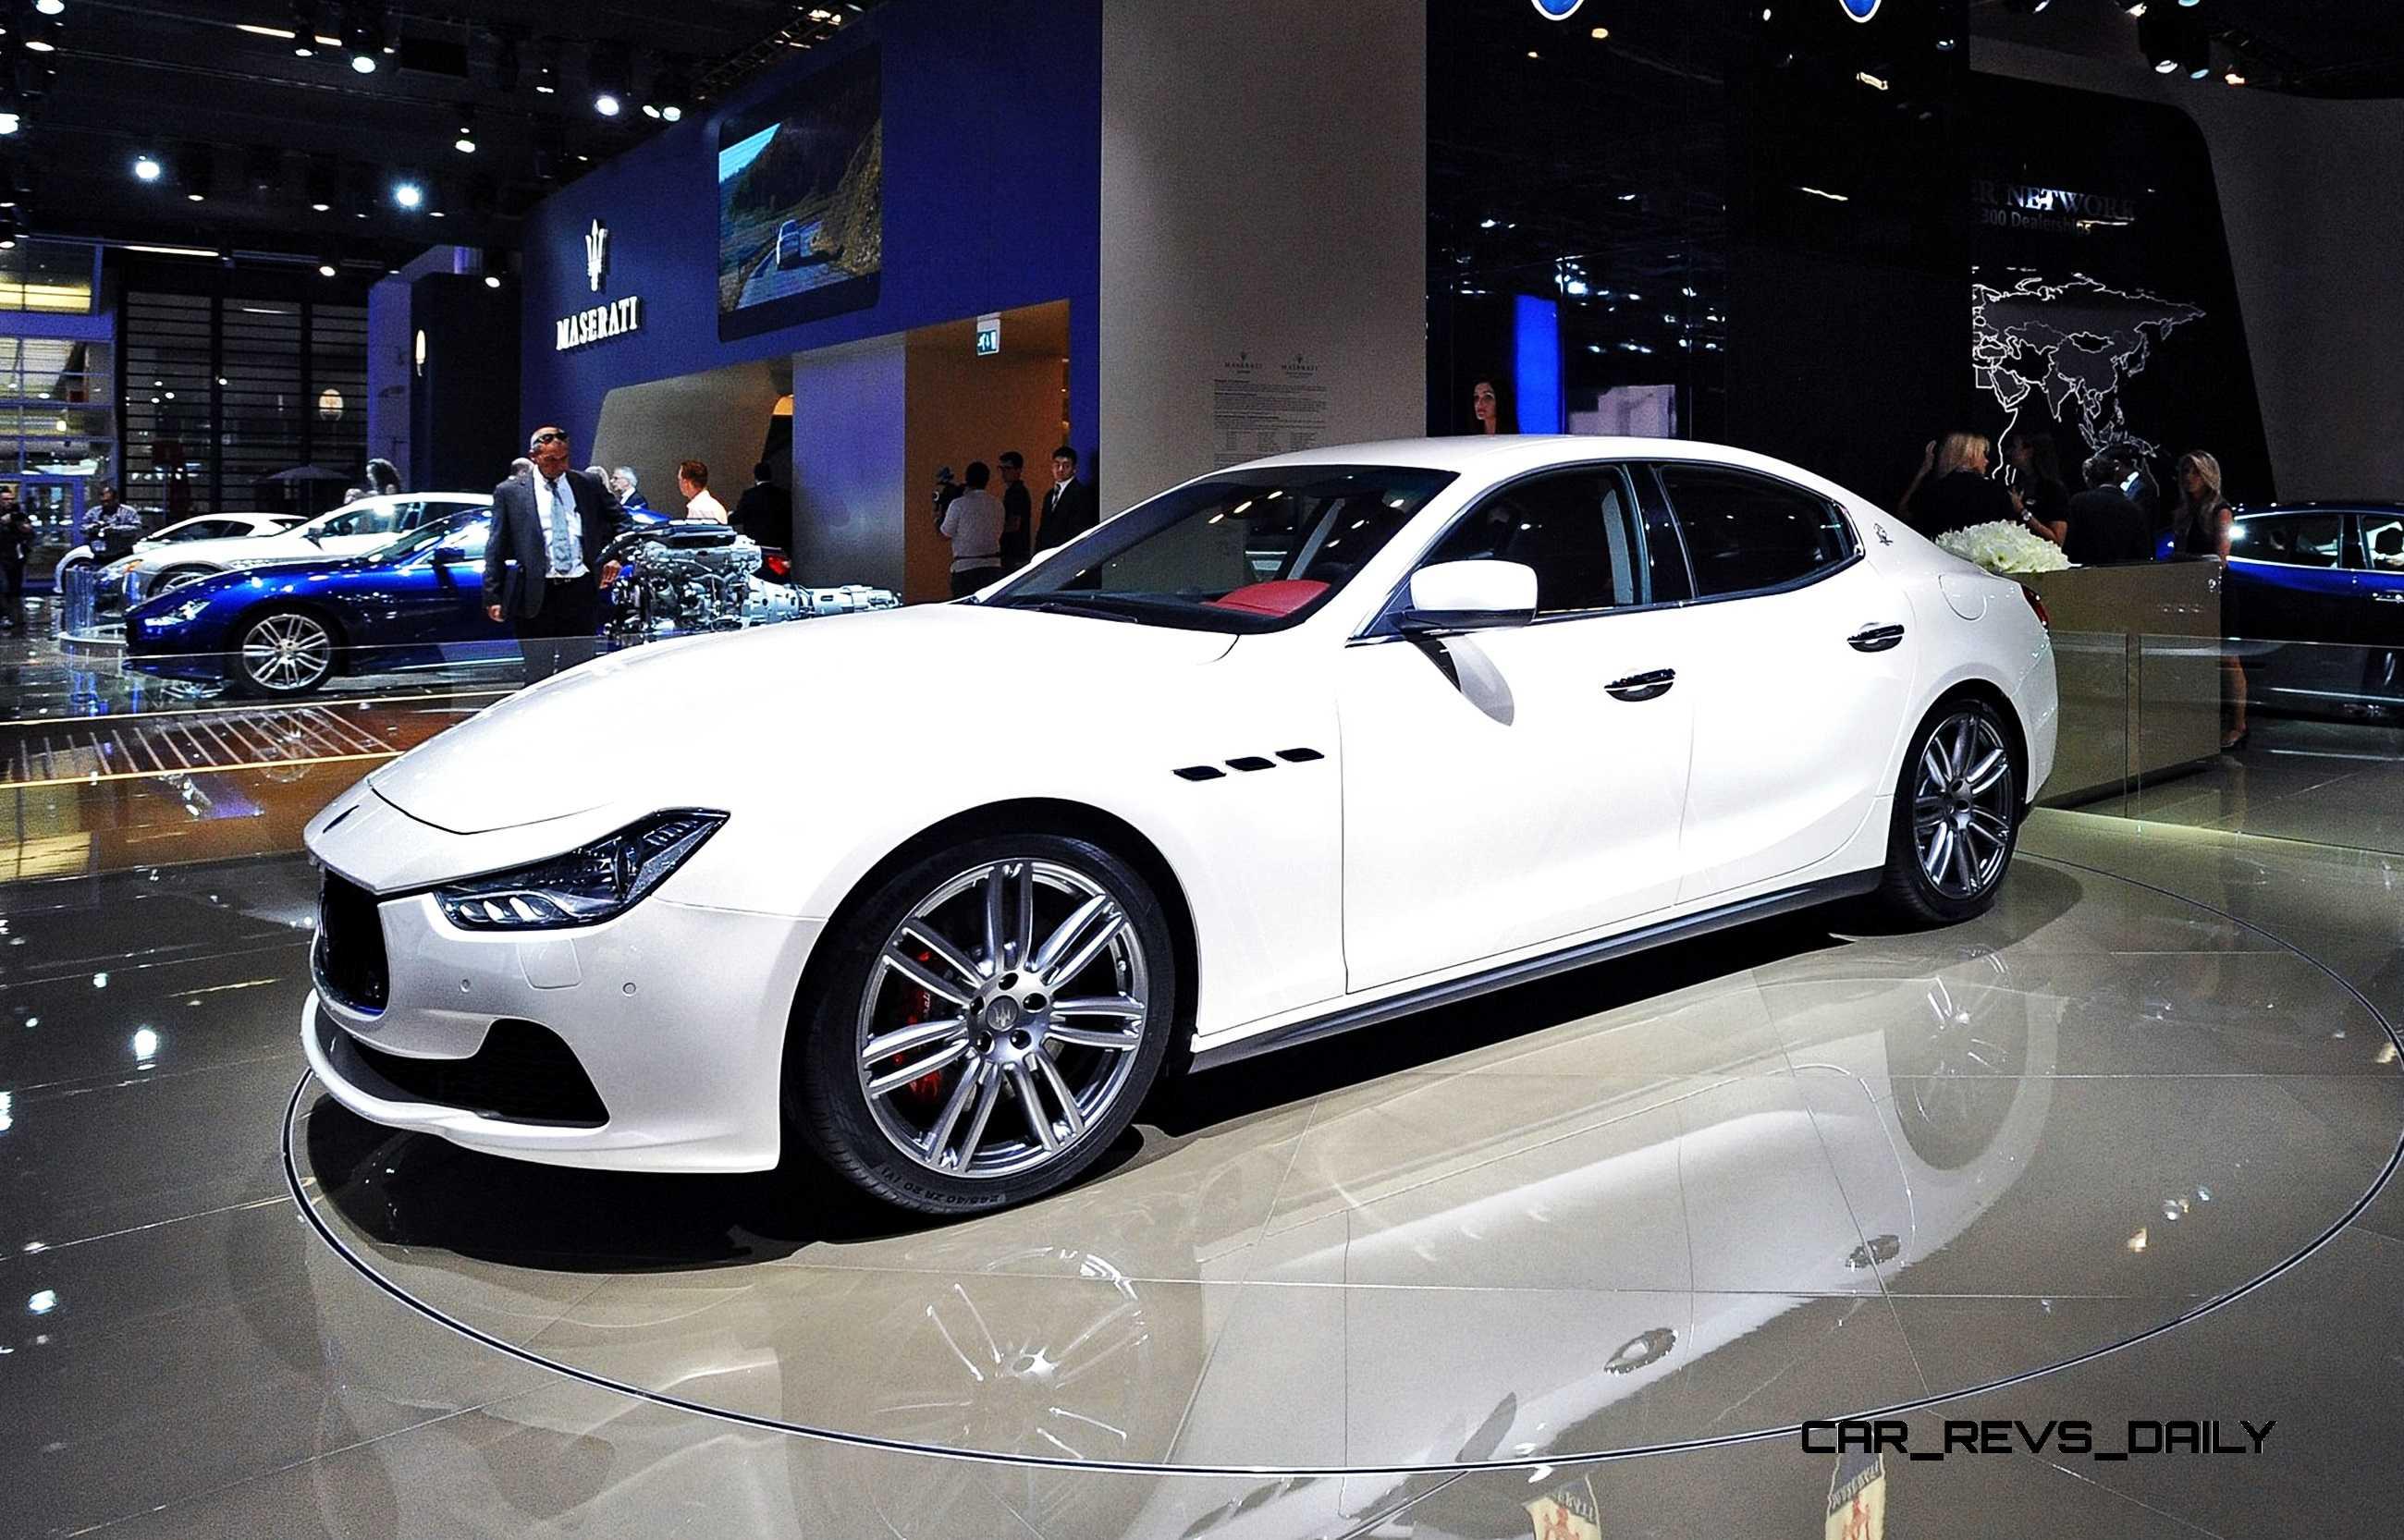 2015 Maserati Ghibli S Q4 ZEGNA EDITION In Exclusive Blue with Silk ...